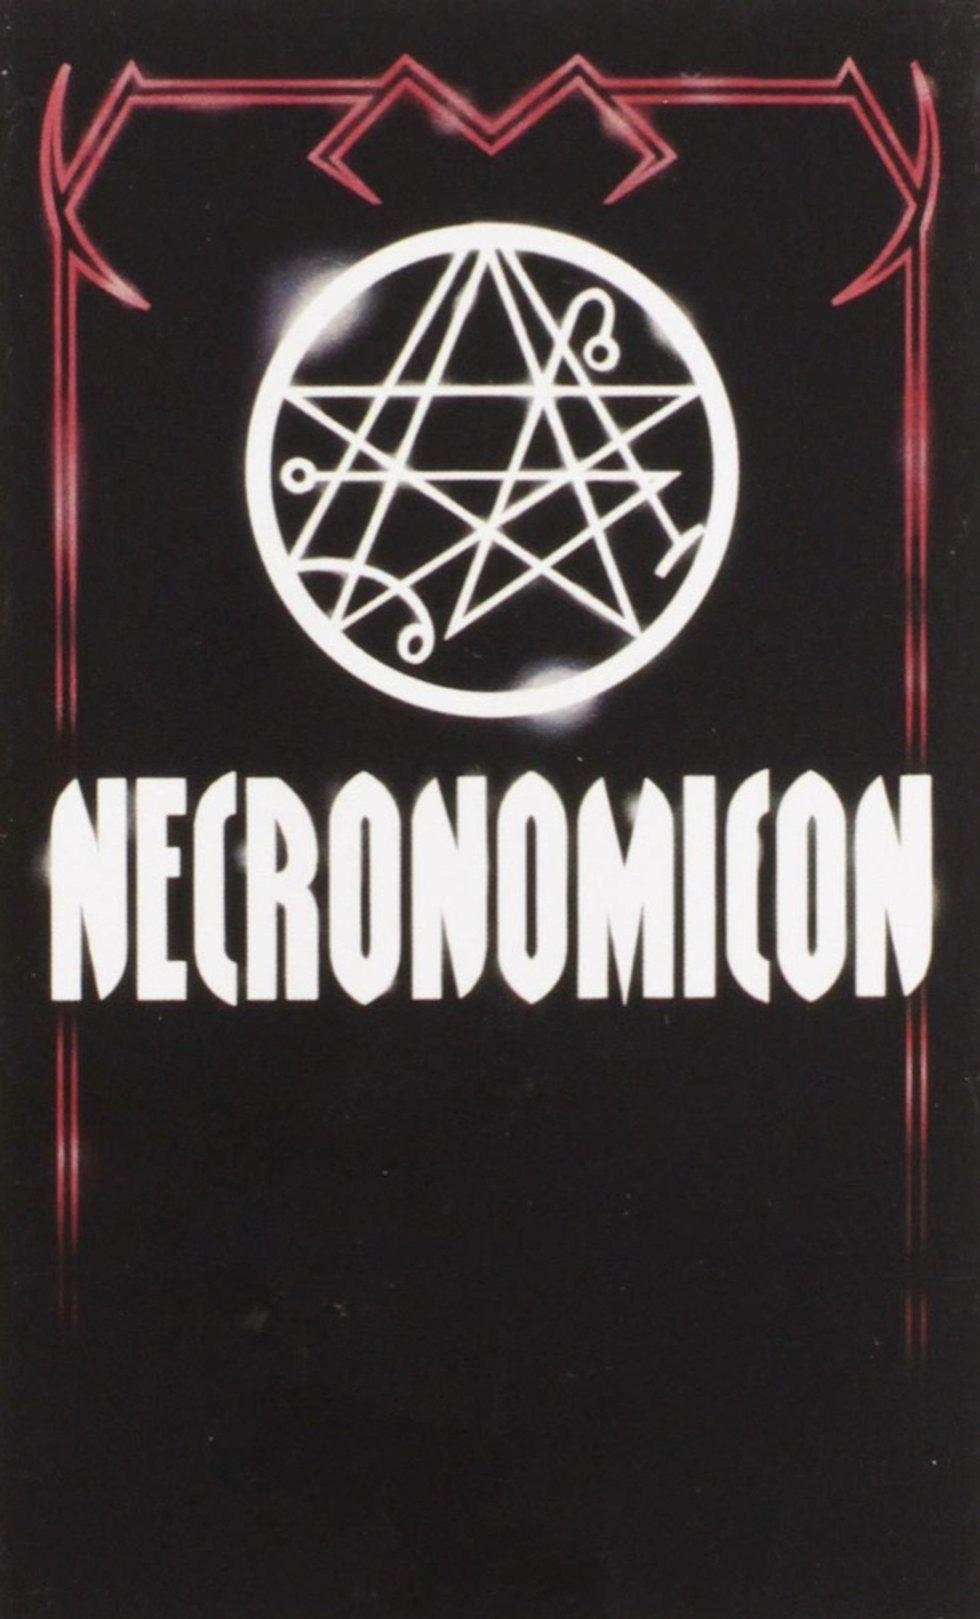 The Necronomicon, or The Book of the Dead